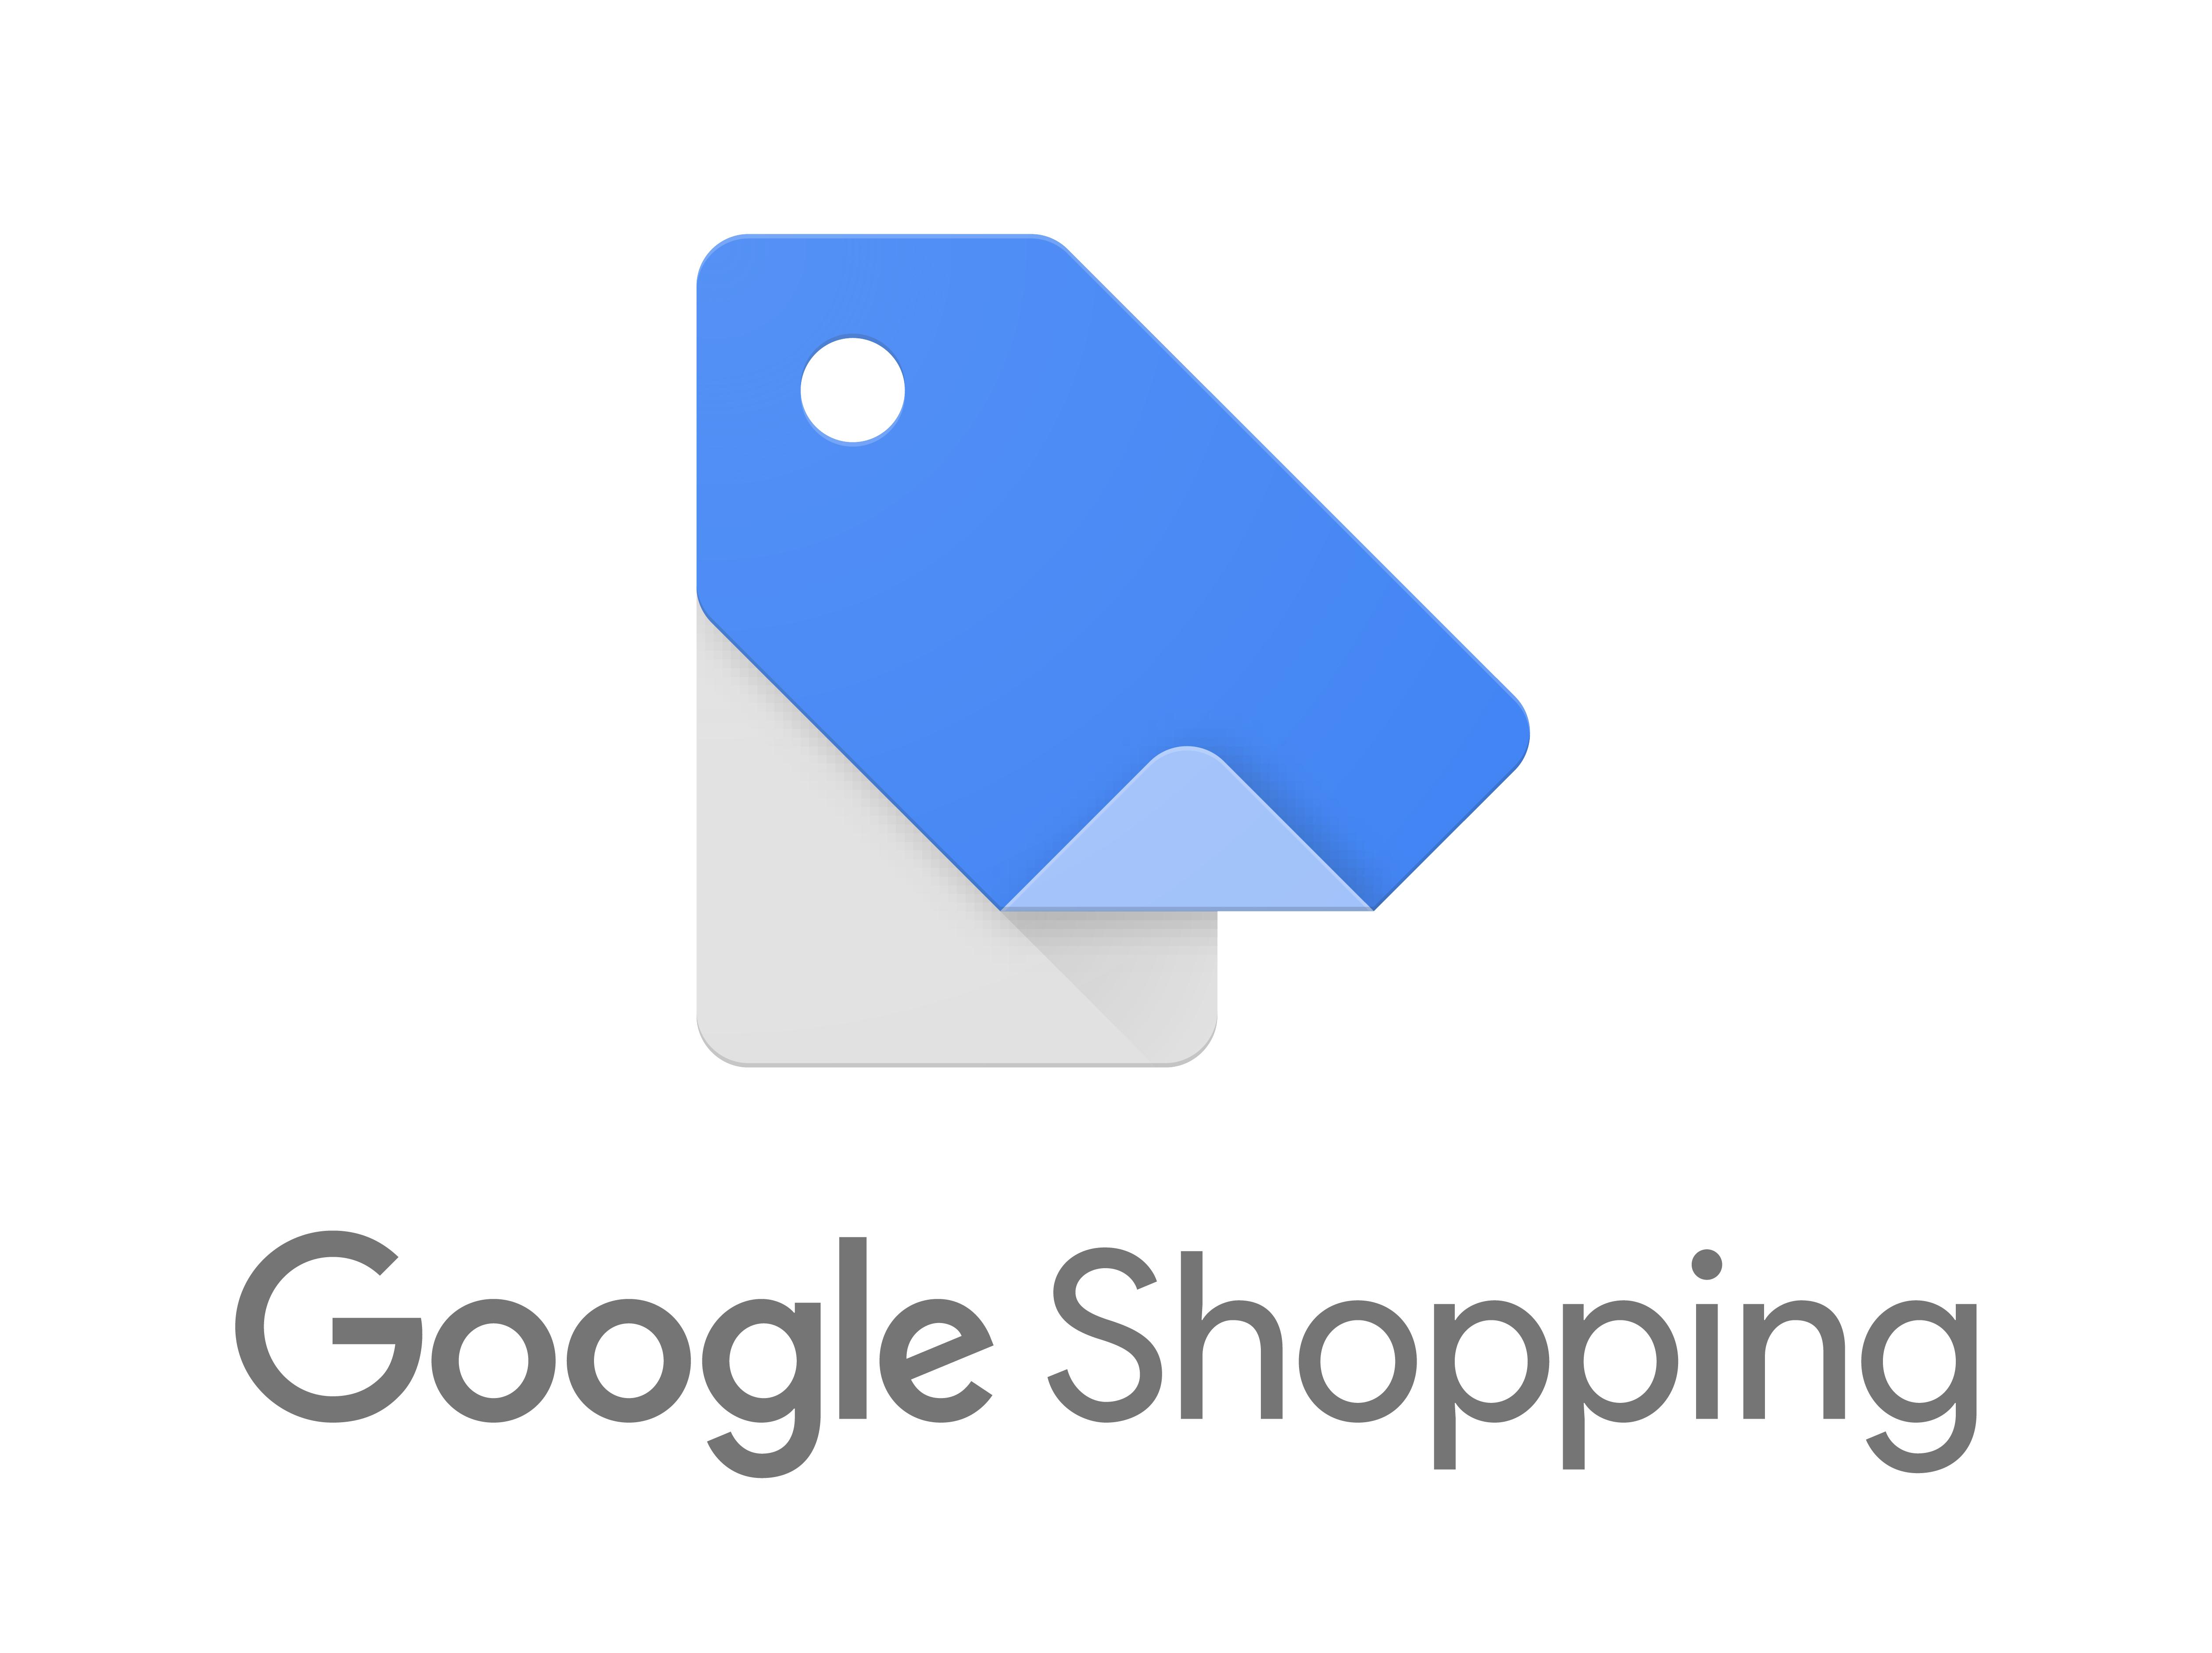 logo_lockup_shopping_icon_vertical-rgb Google Shopping Anzeigen